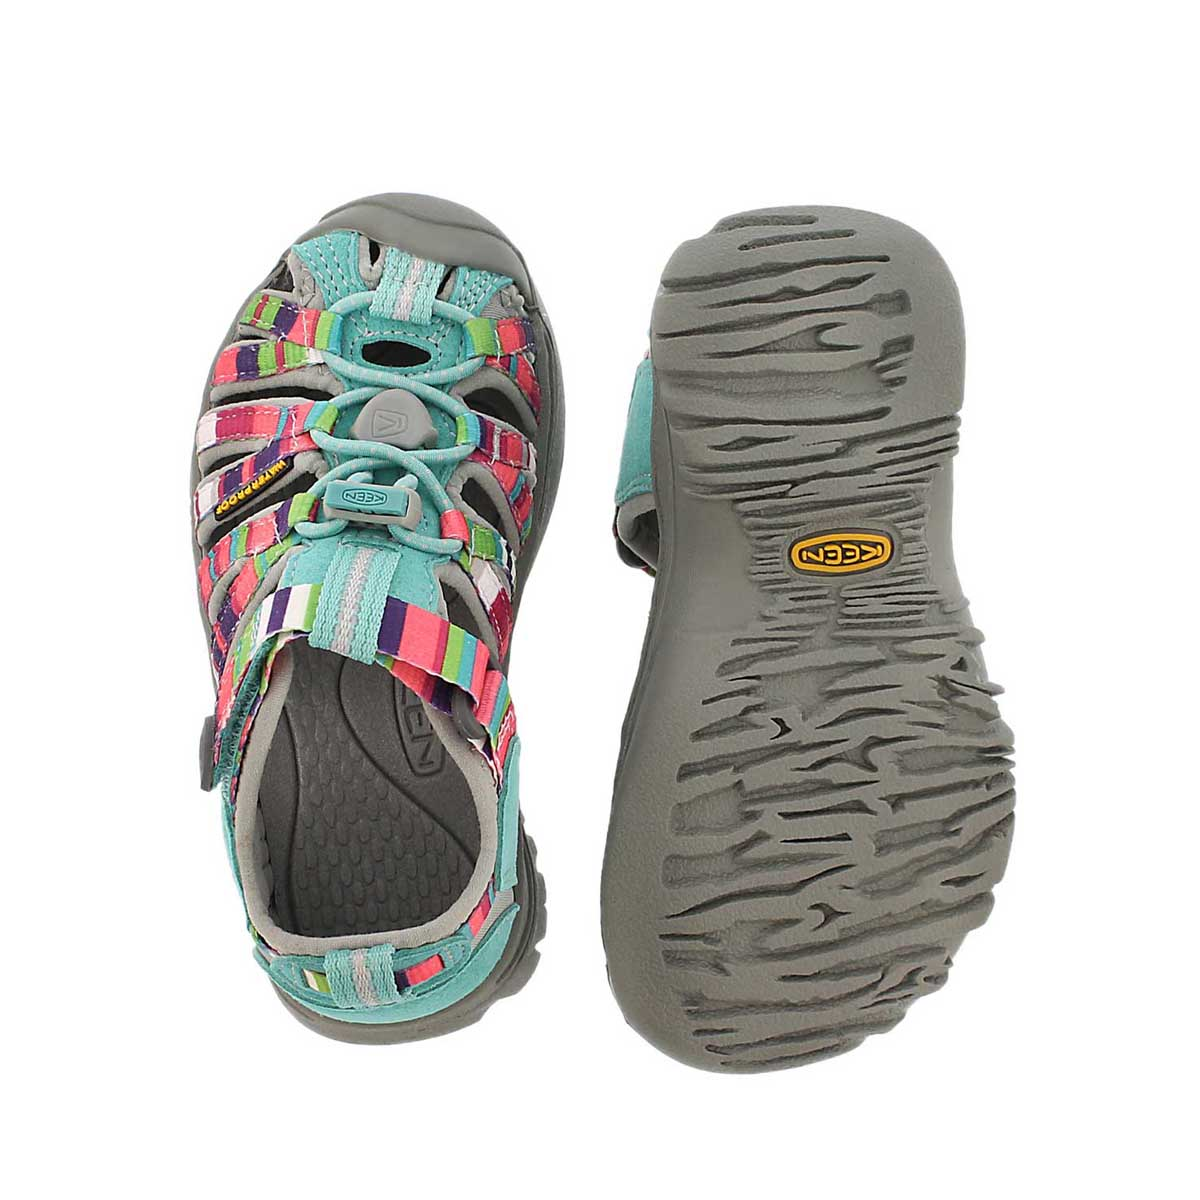 Sandale sport WHISPER, fusion raya, bébé